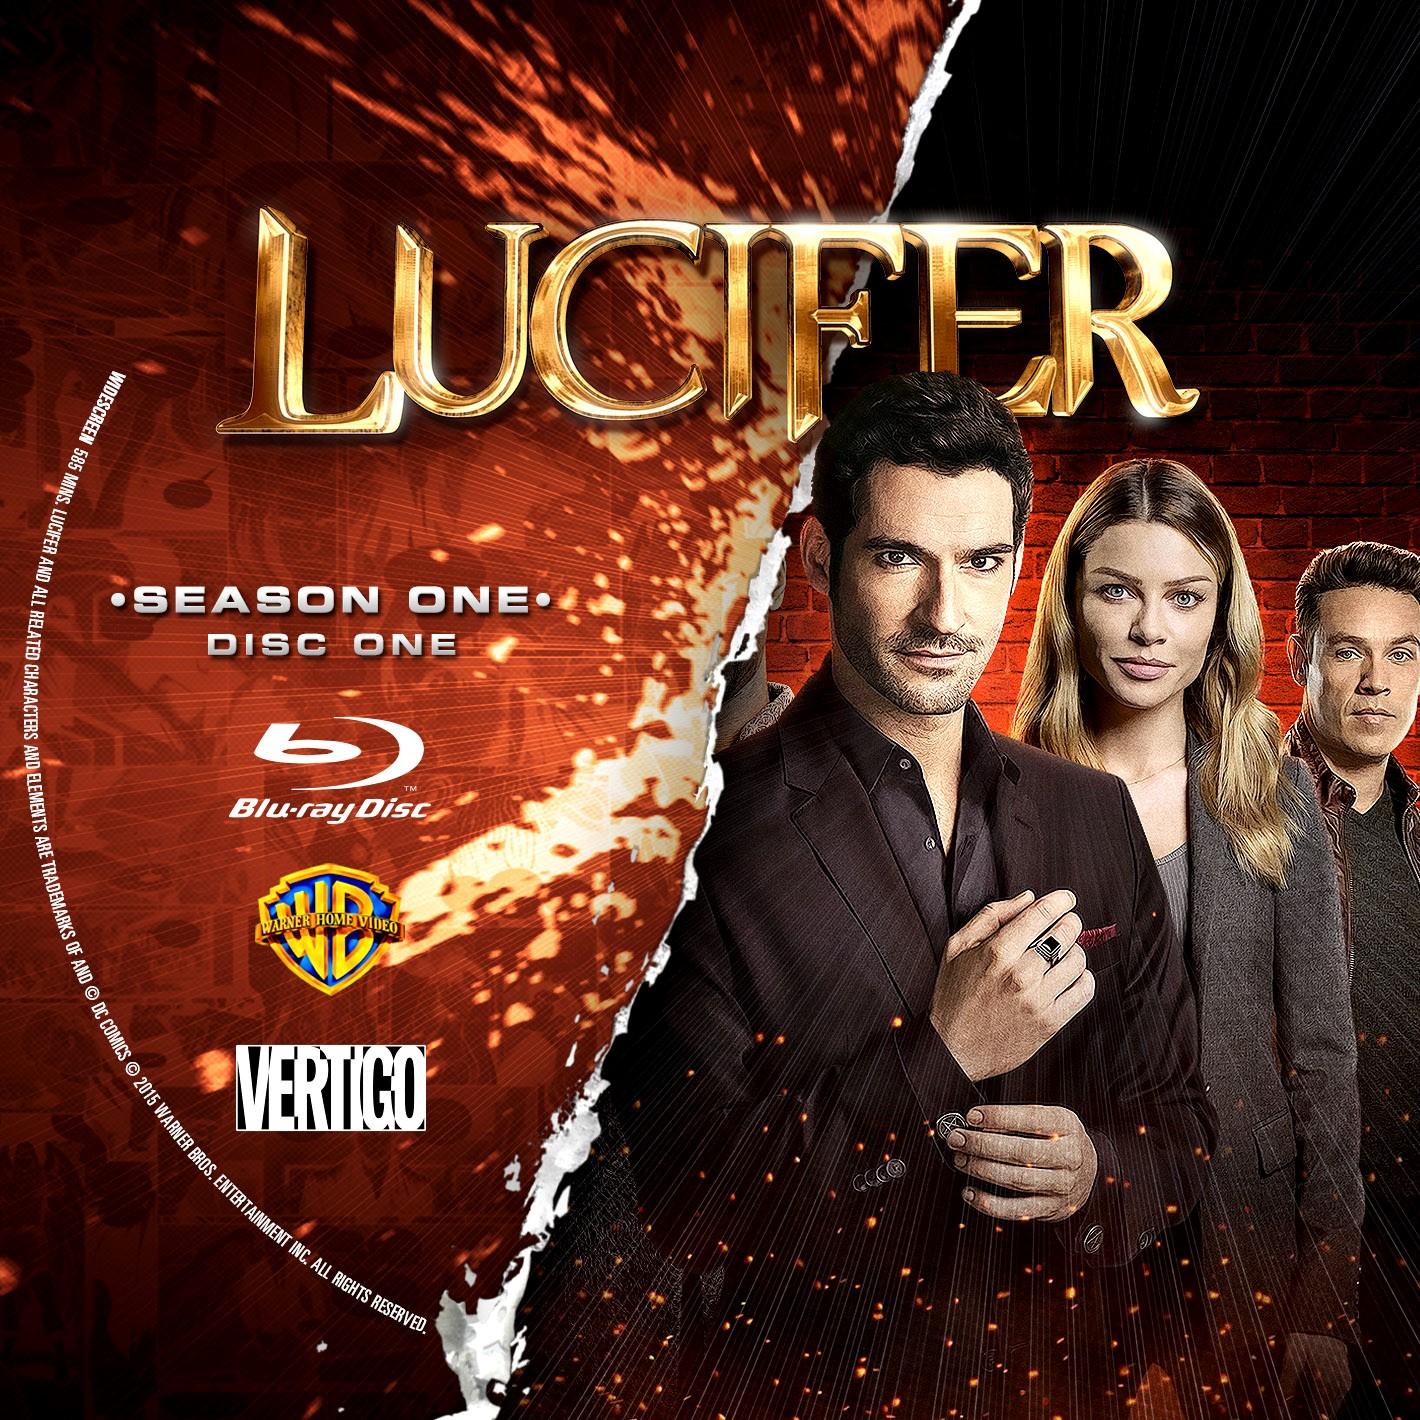 Lucifer Season 1 Disc 1-2 Bluray Label